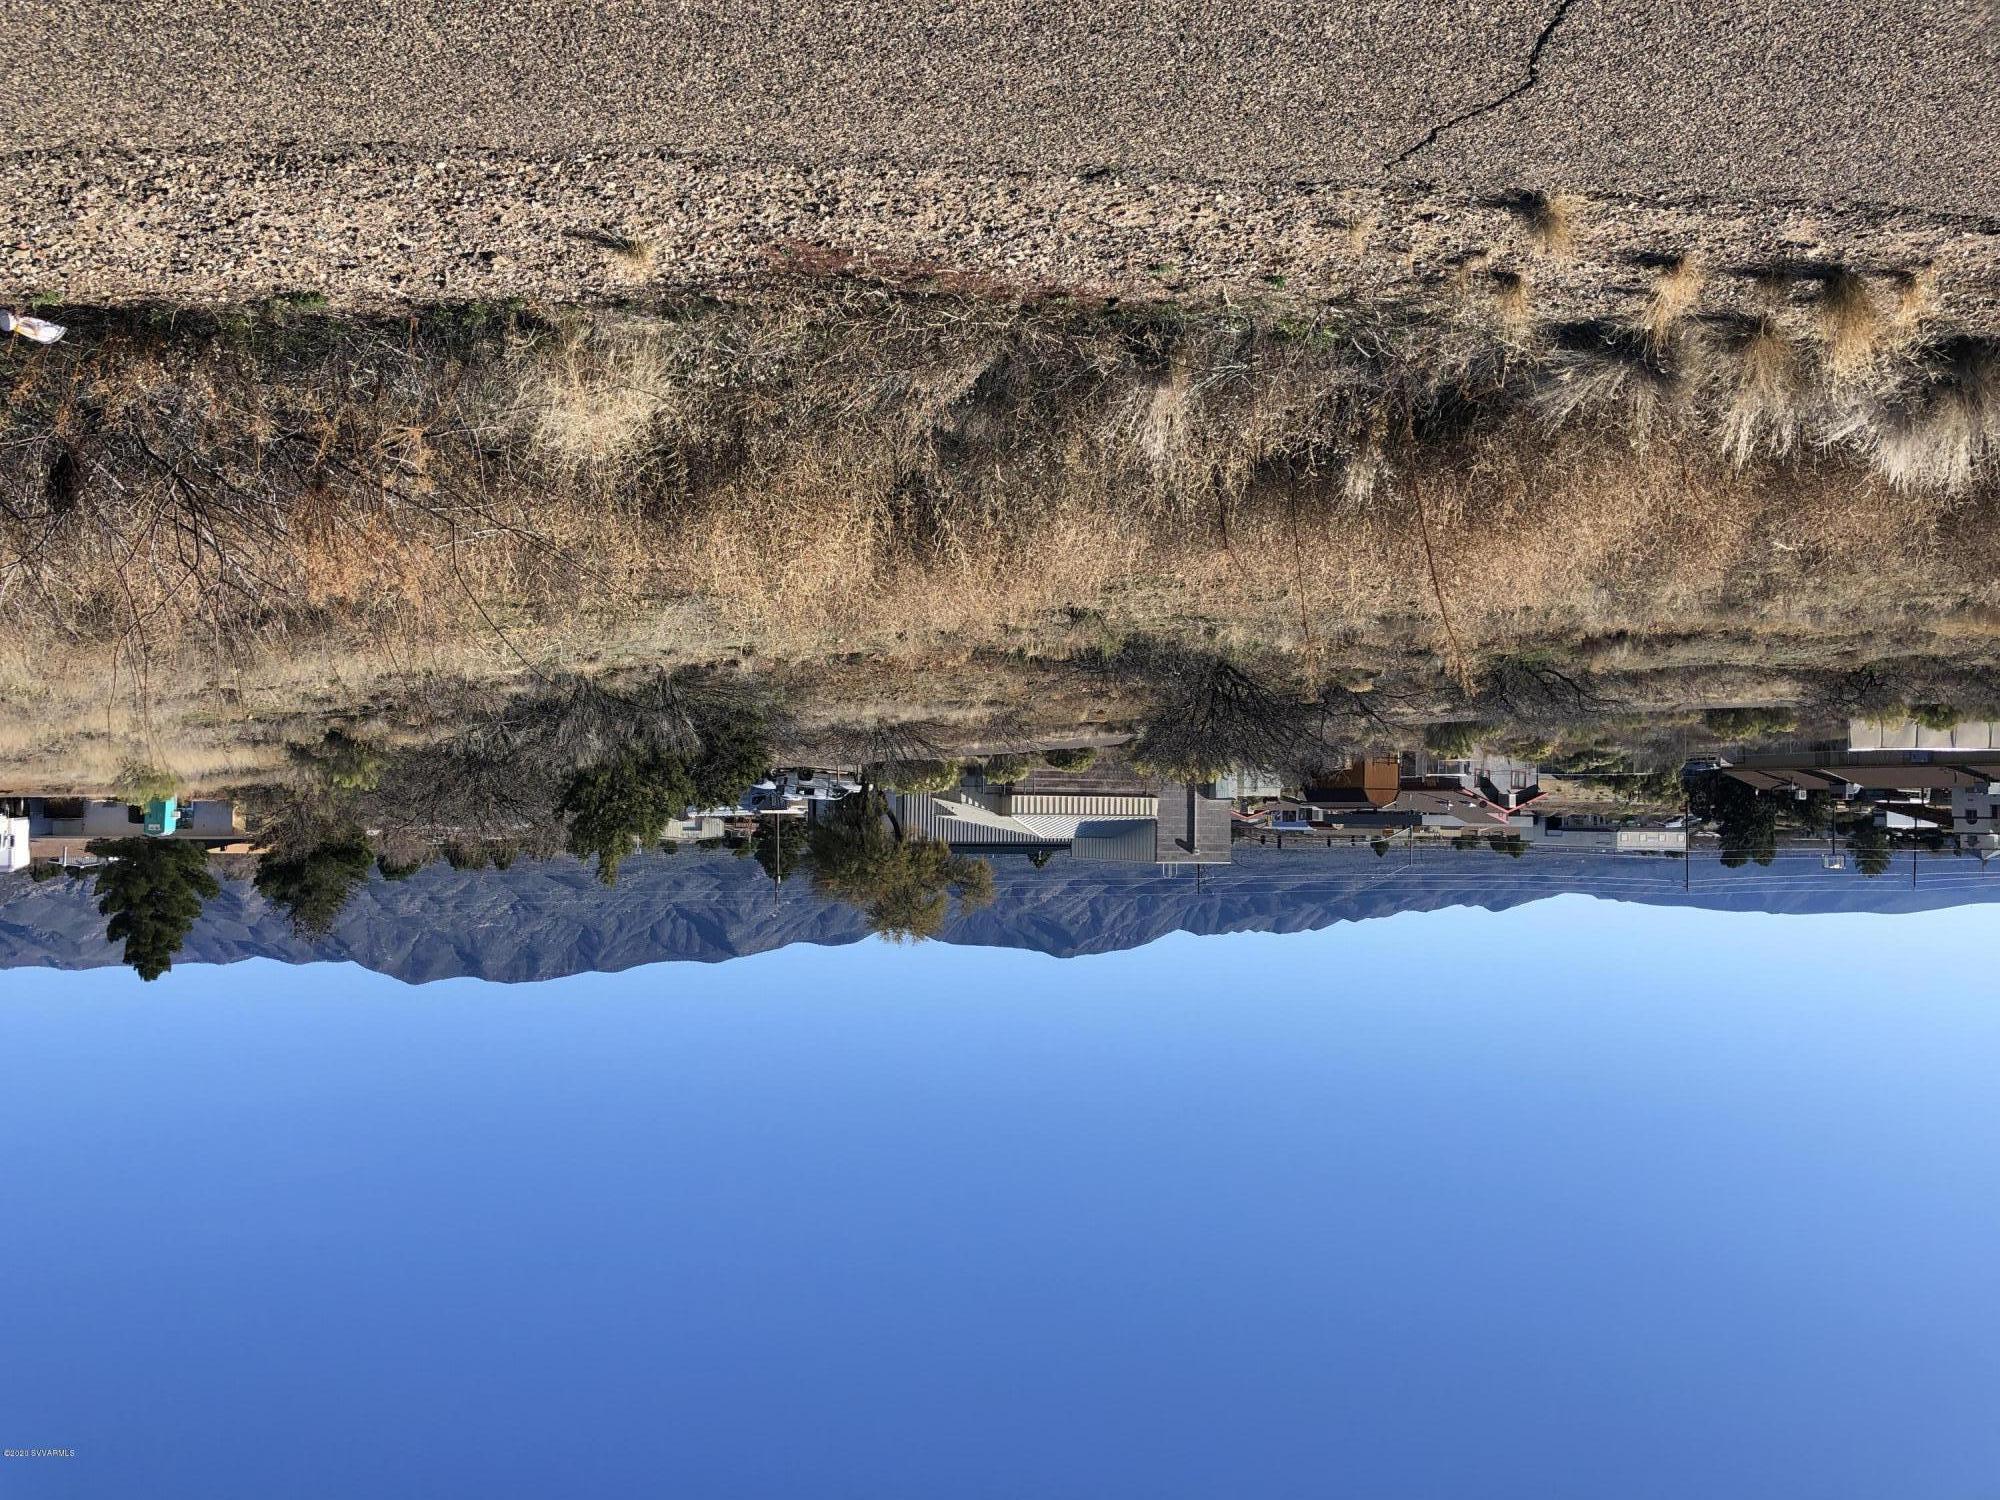 2553 S Village Cottonwood, AZ 86326